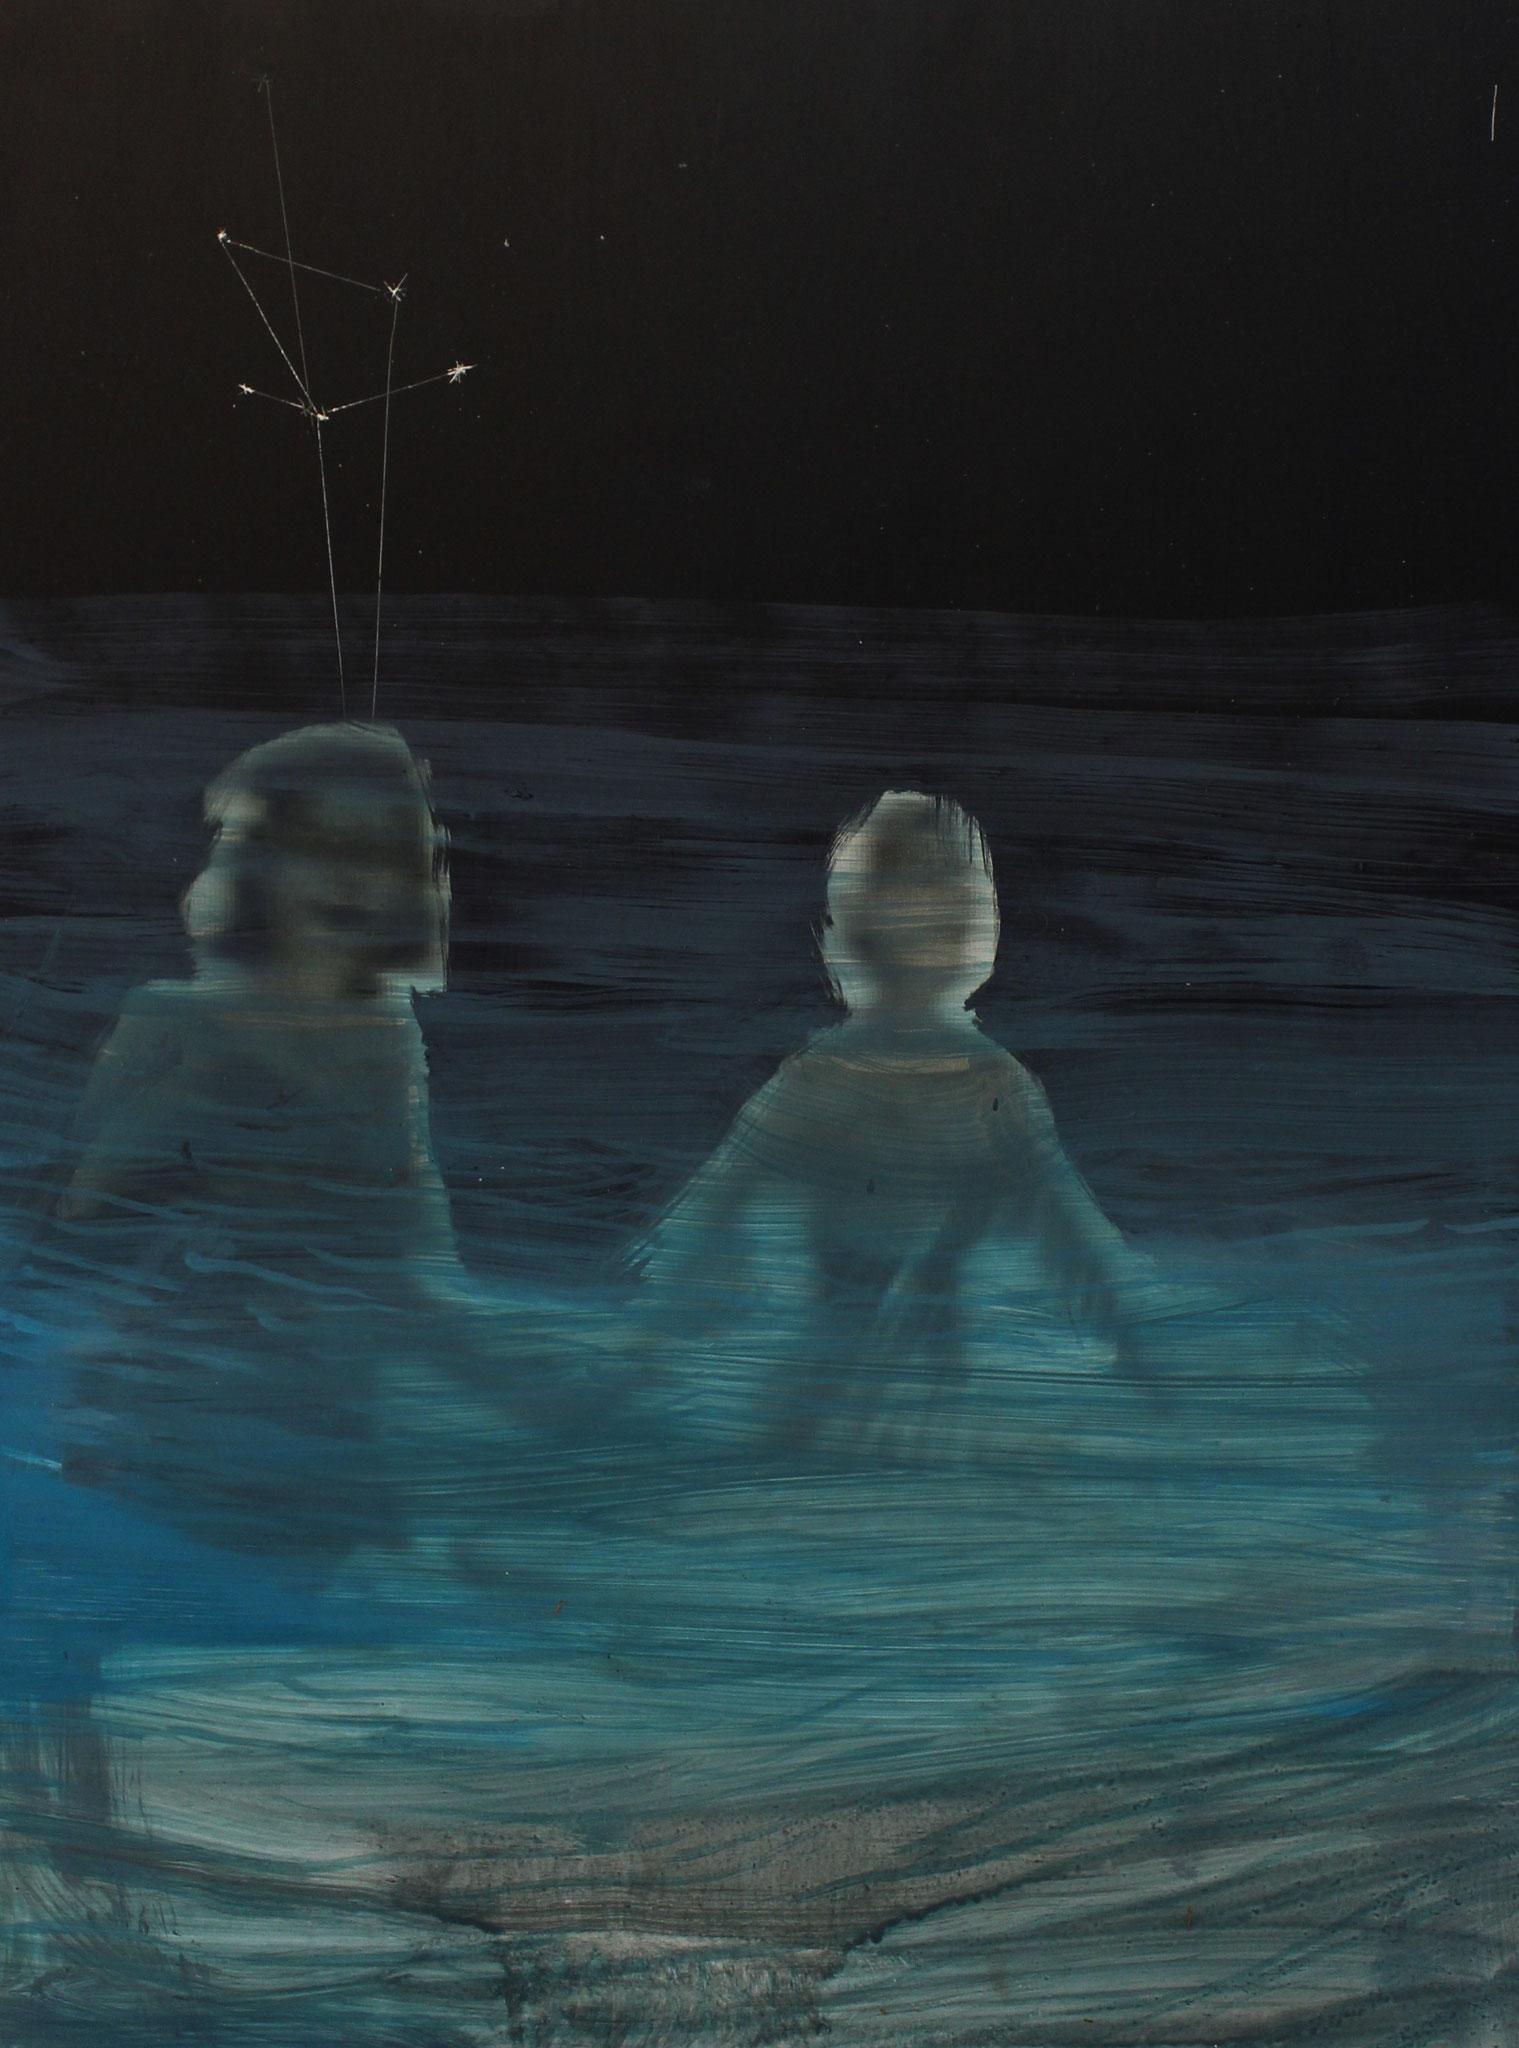 """nightswimming 04"", acryl und öl auf bedrucktem alu-dibond, 2016"